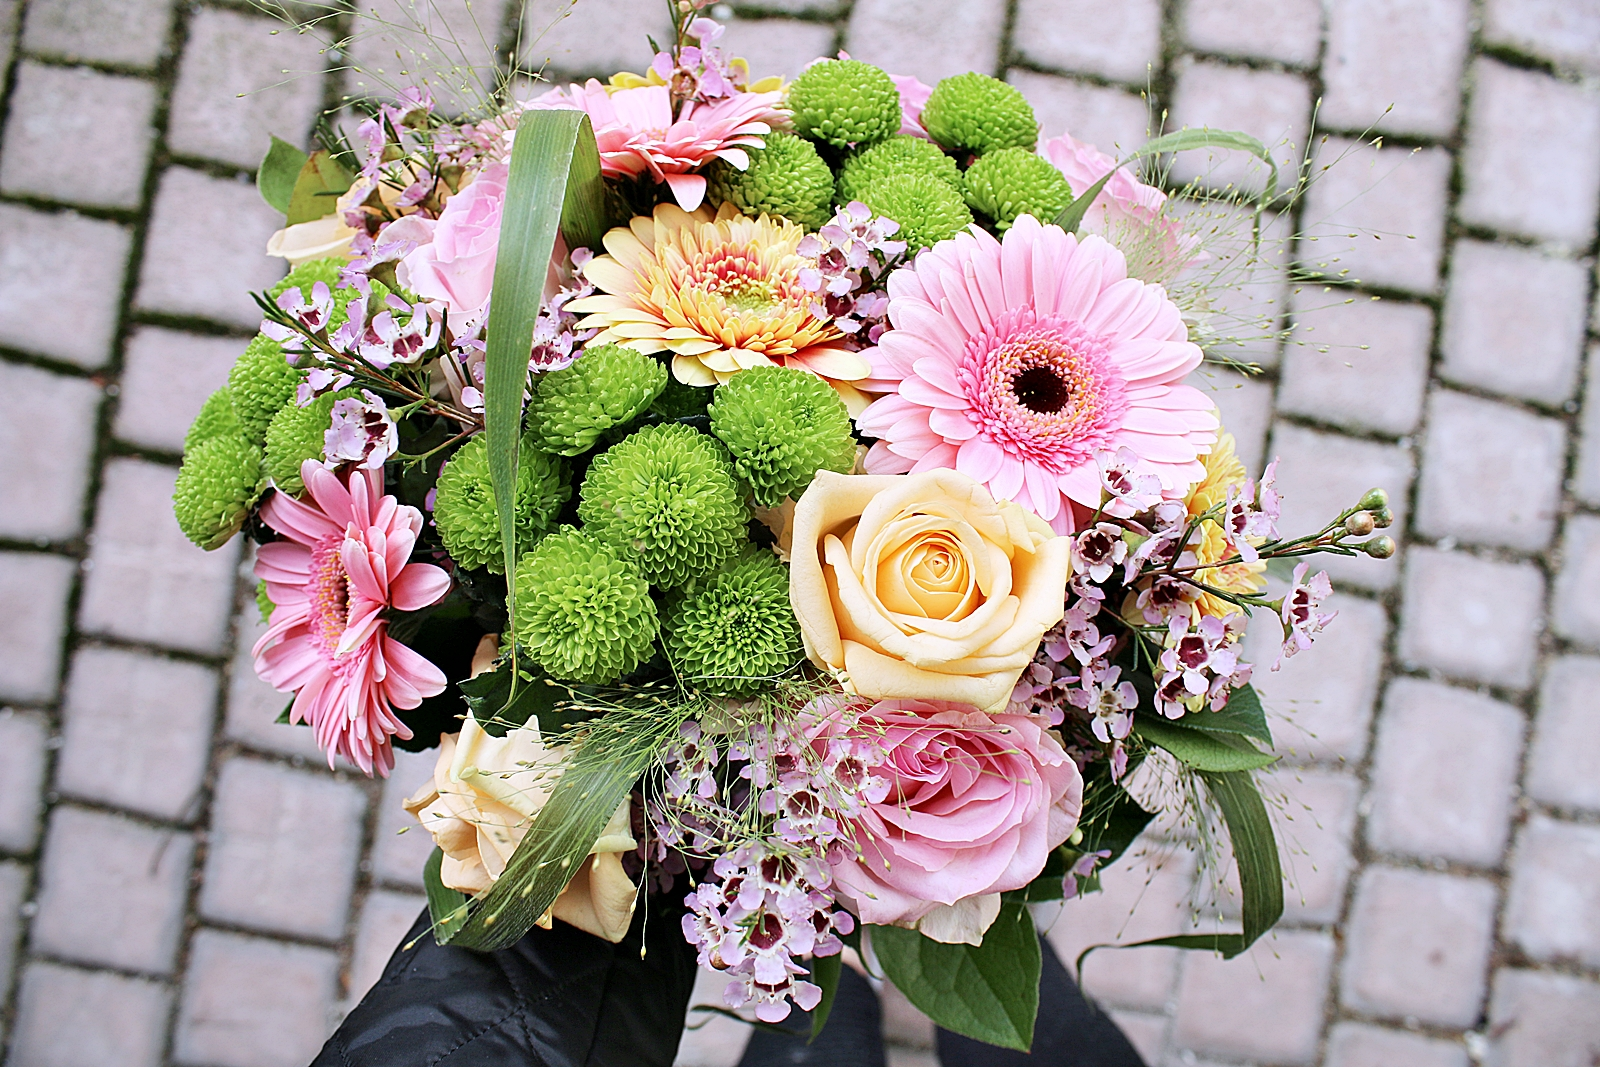 En bättre helg med vårig blomsterbukett